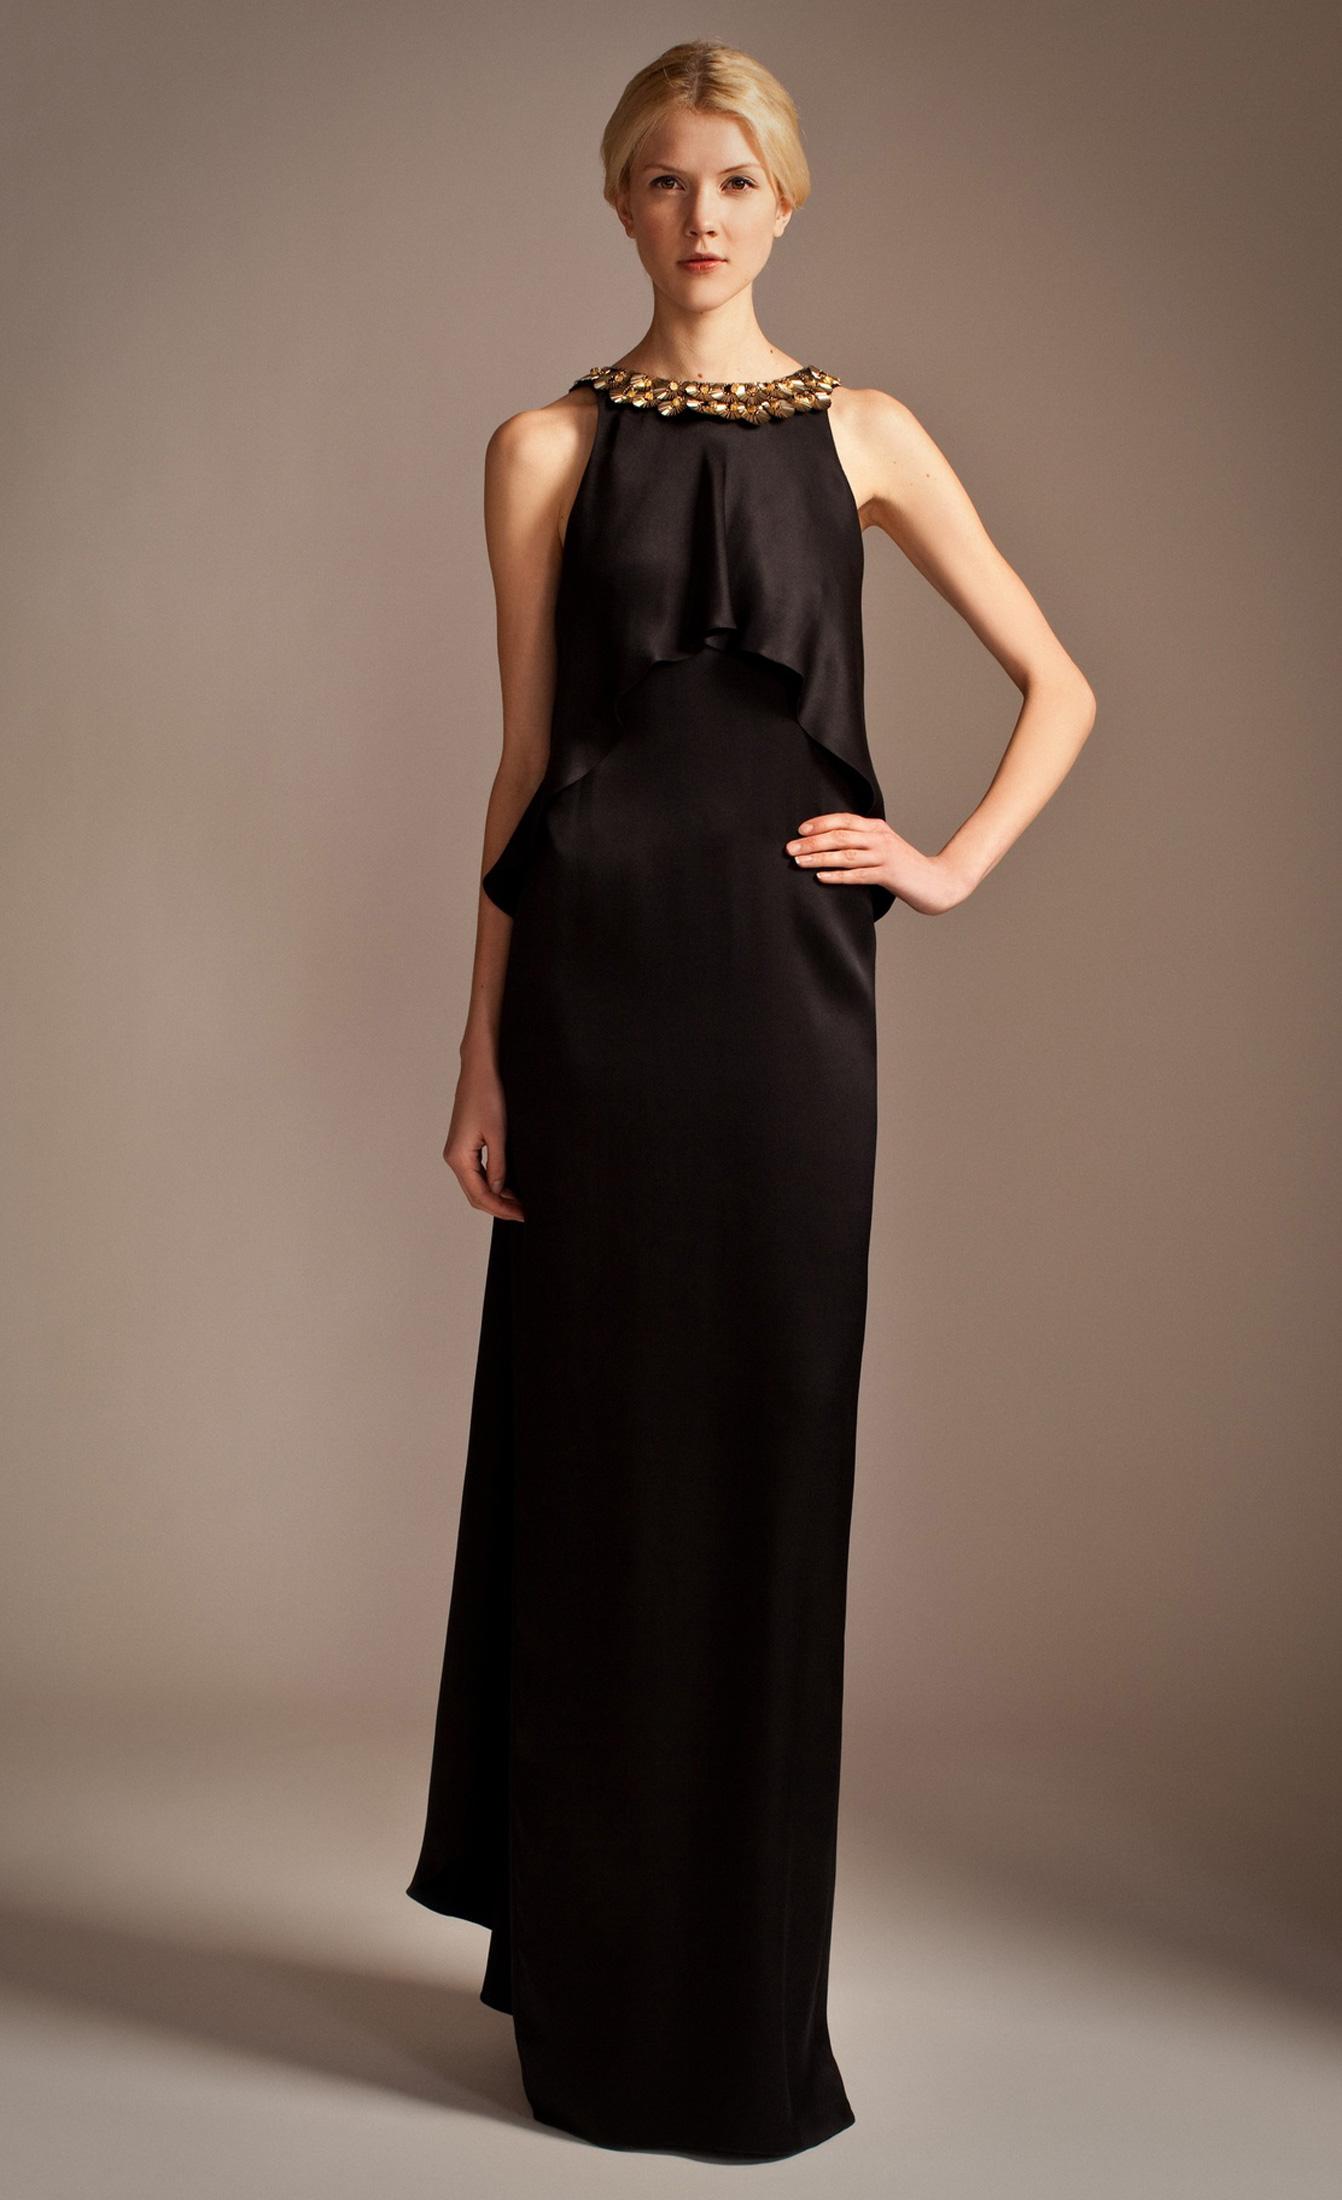 Lyst Temperley London Long Goldina Necklace Dress In Black